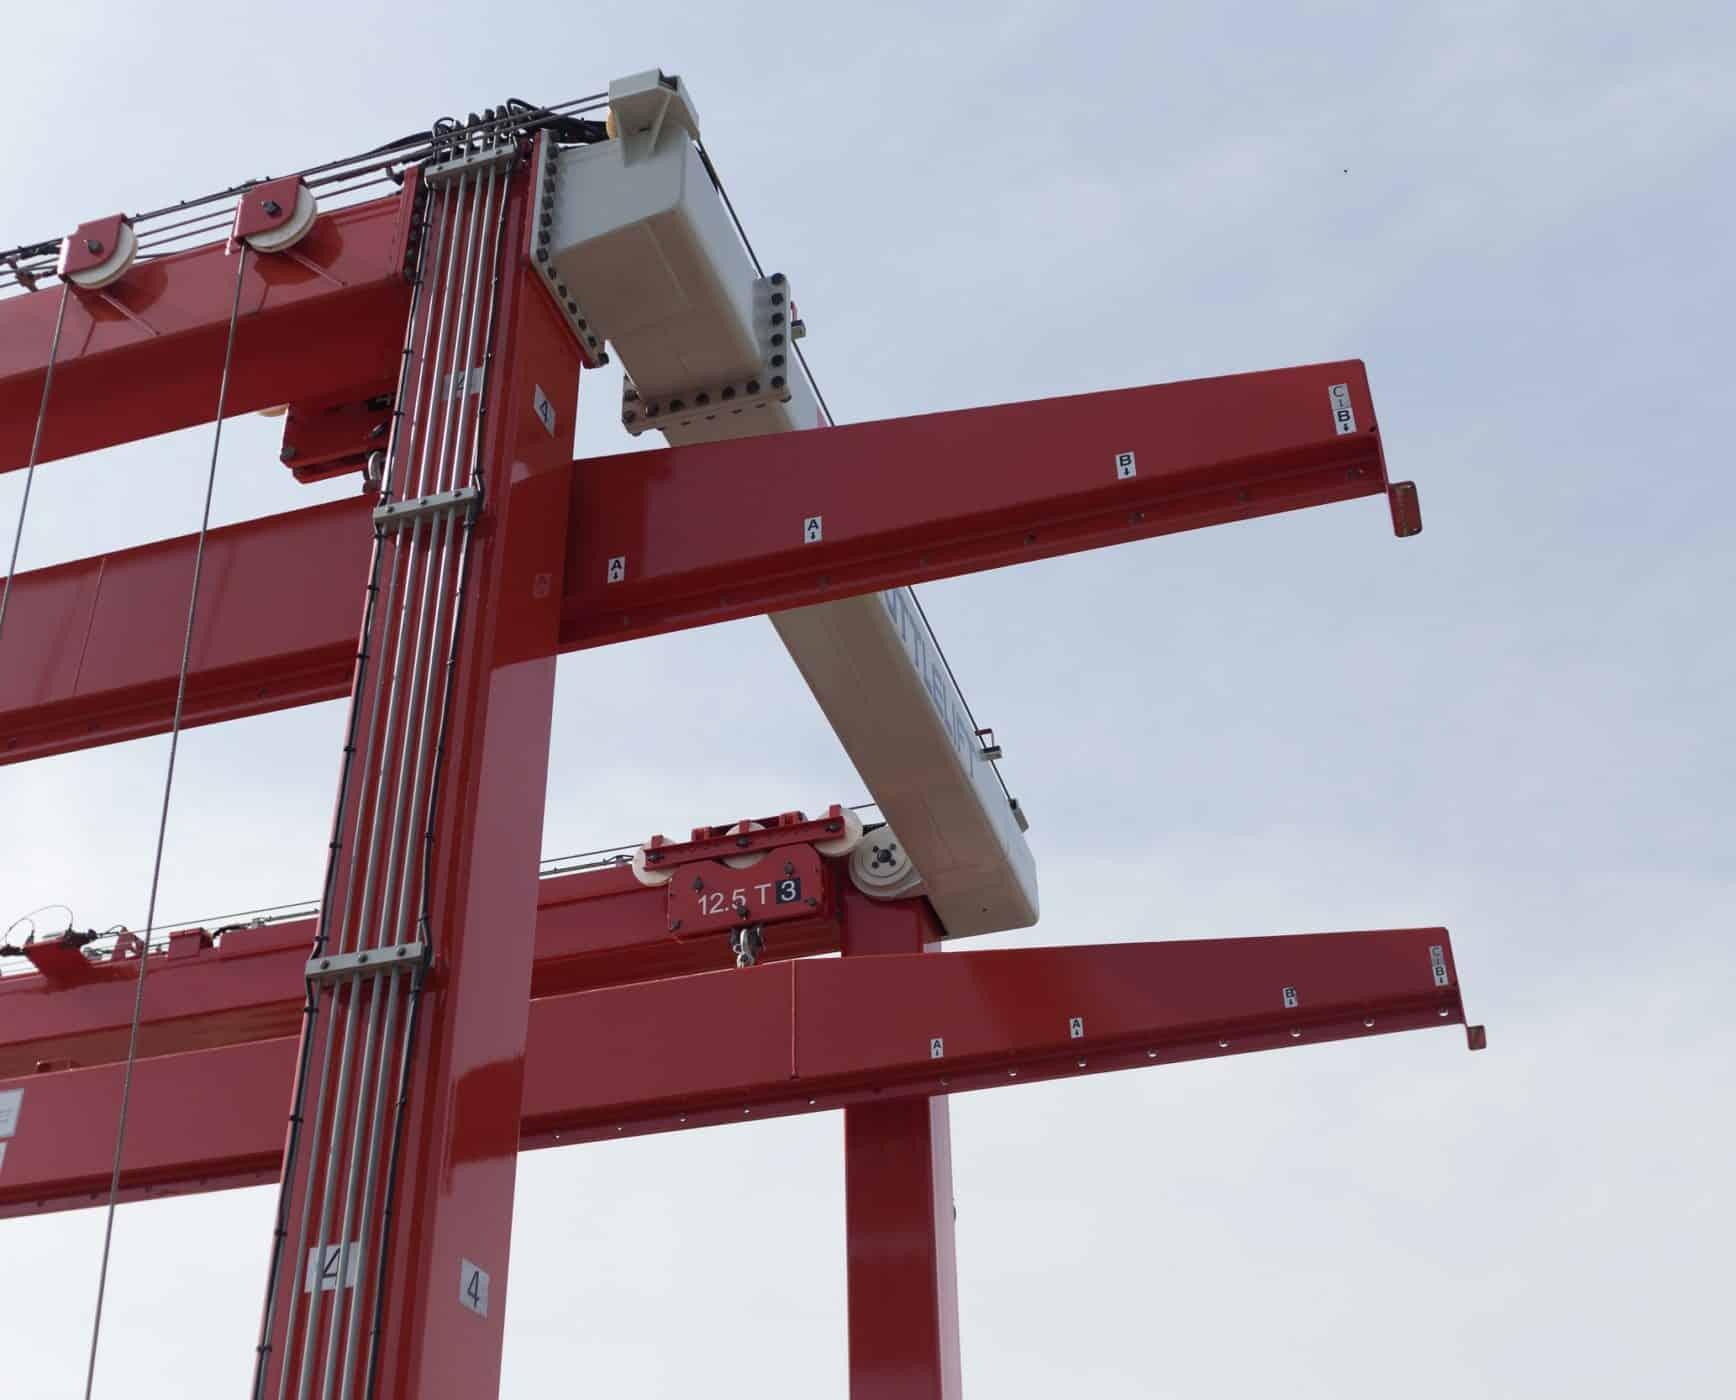 SL gantry crane with spreaders